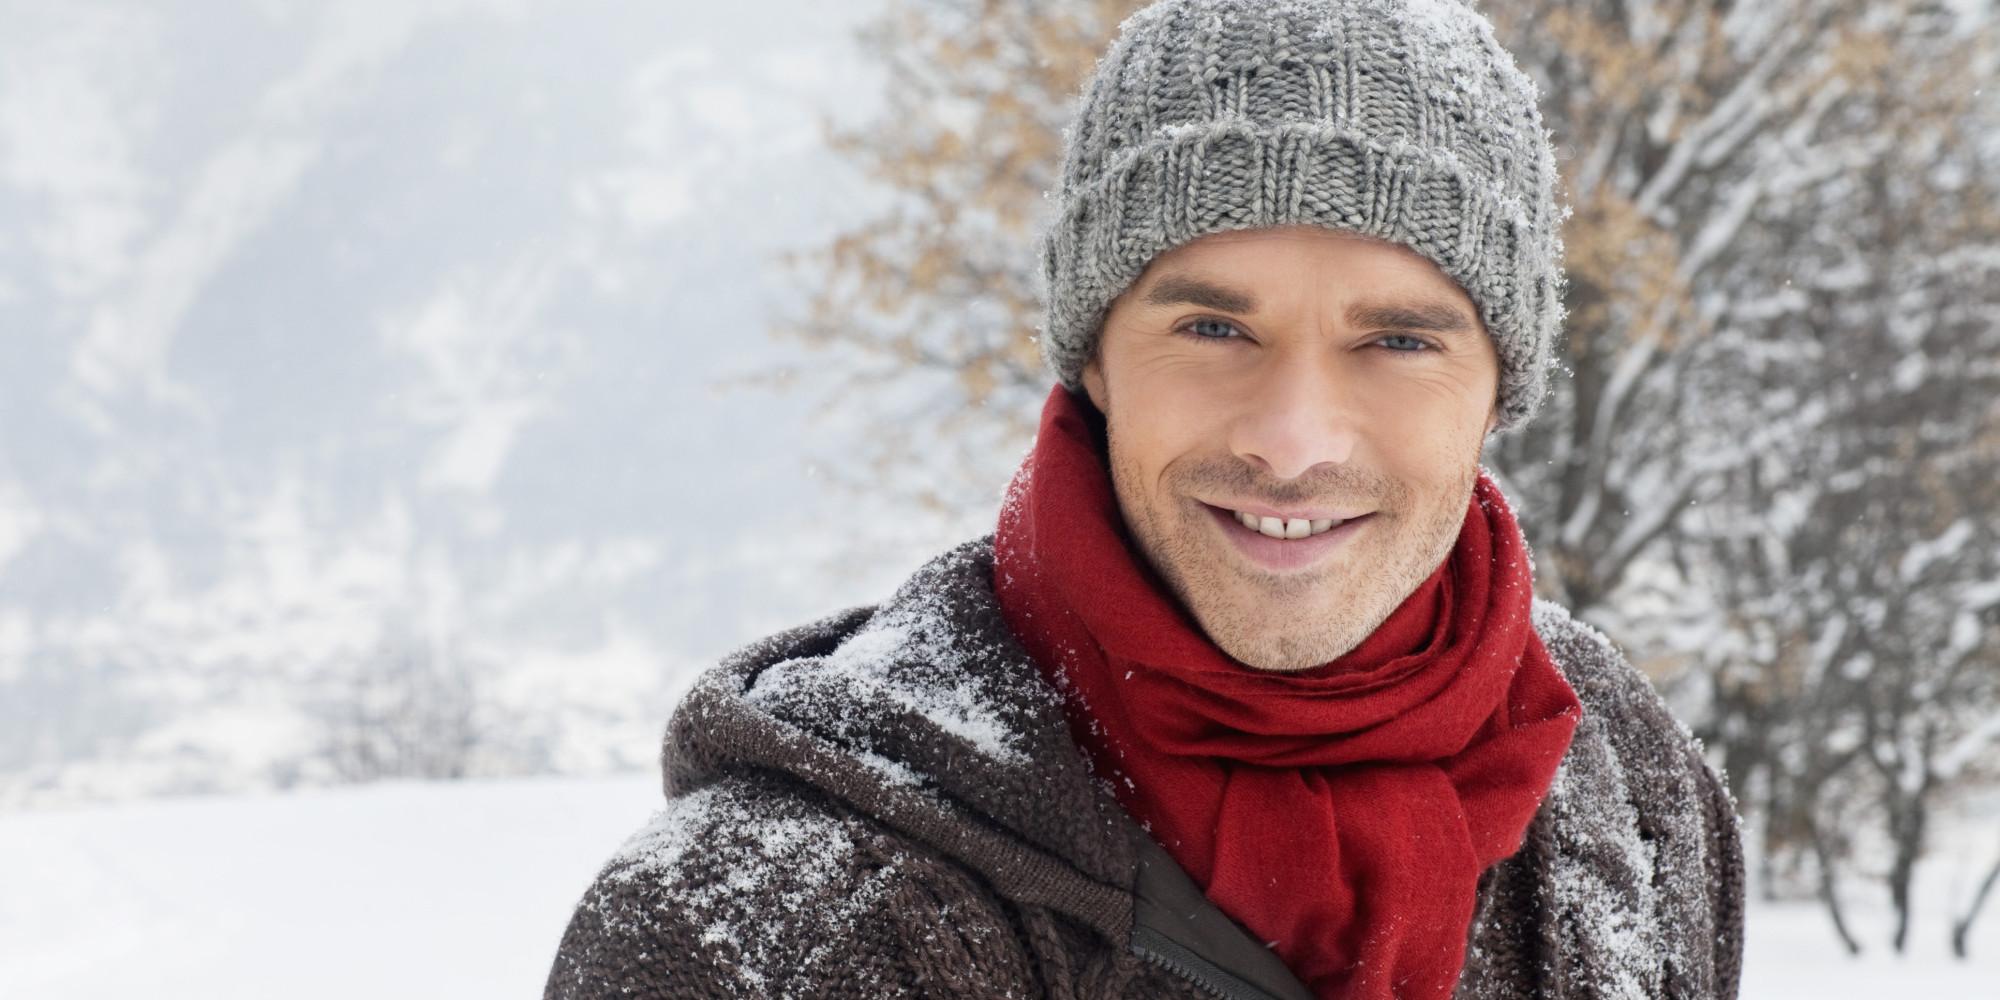 Winter man photo